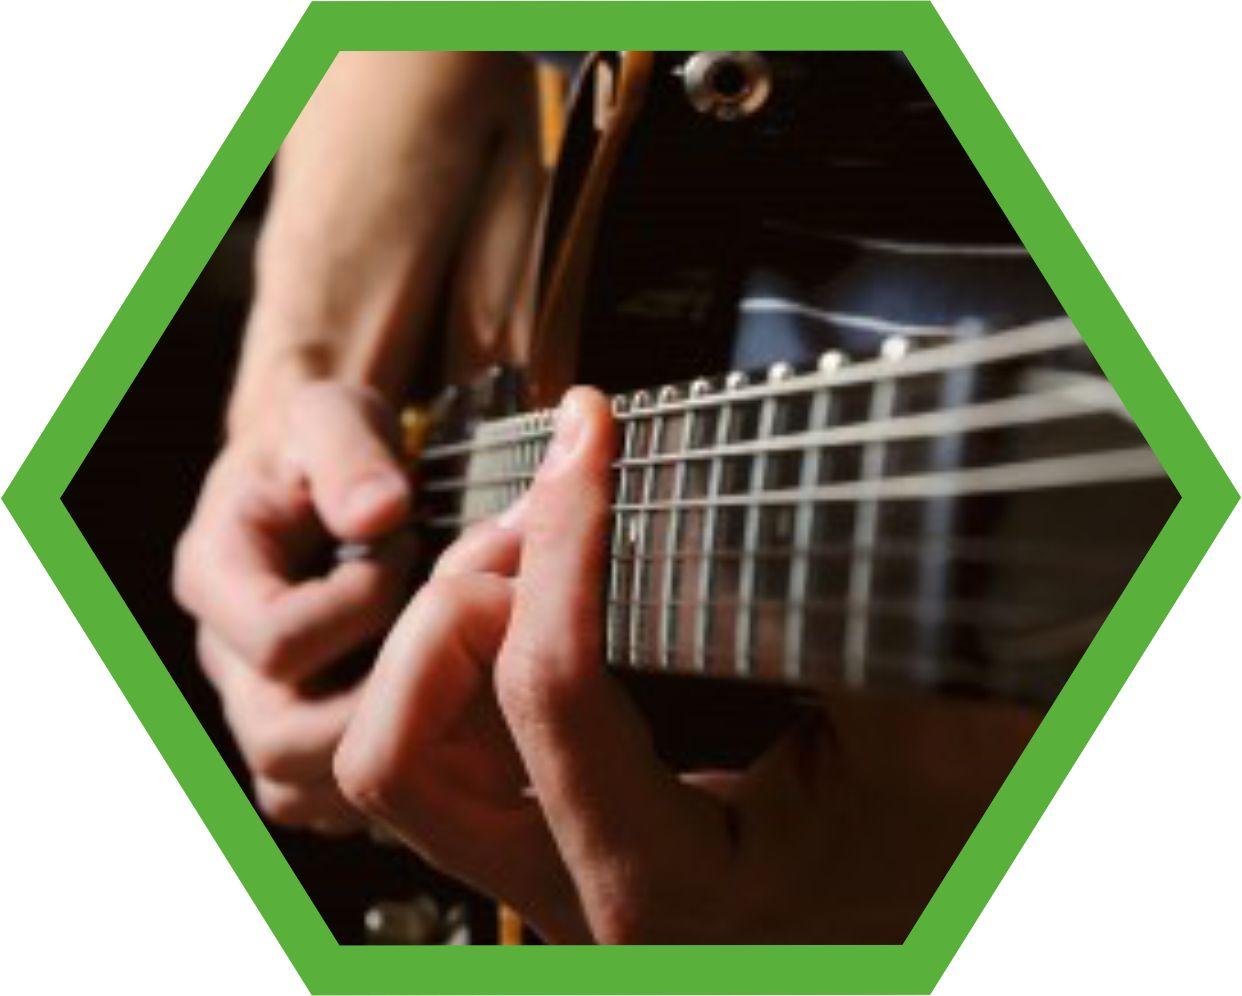 guitartCard_Puzzard_AugmentedReality